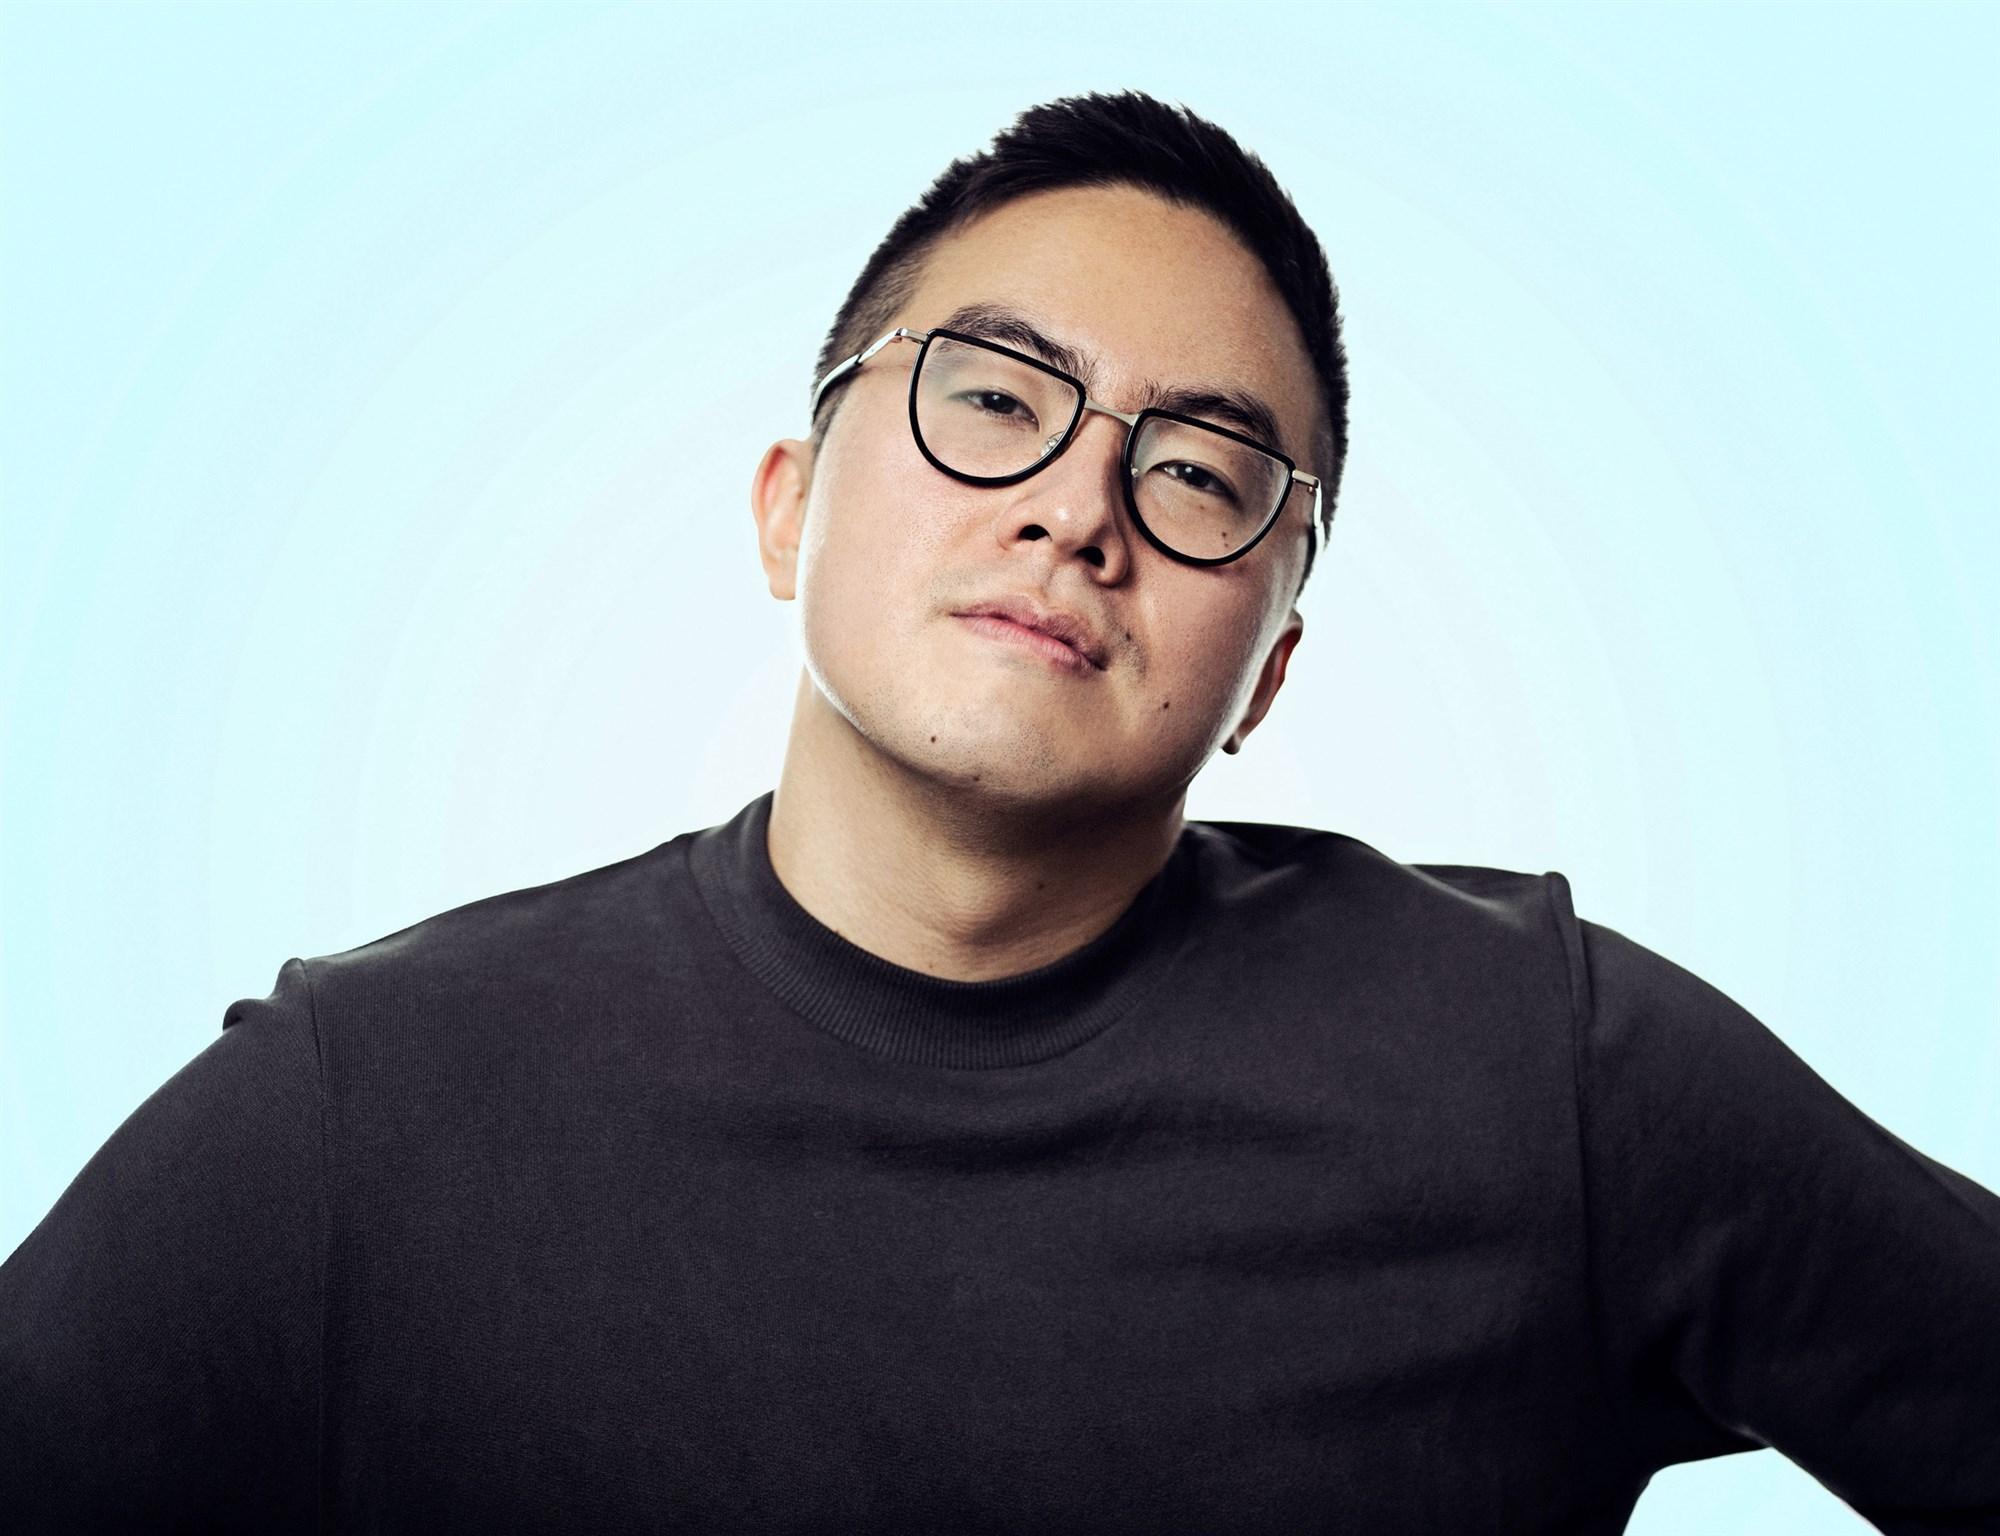 'SNL' Hired Bowen Yang, But It Still Has a Diversity Problem